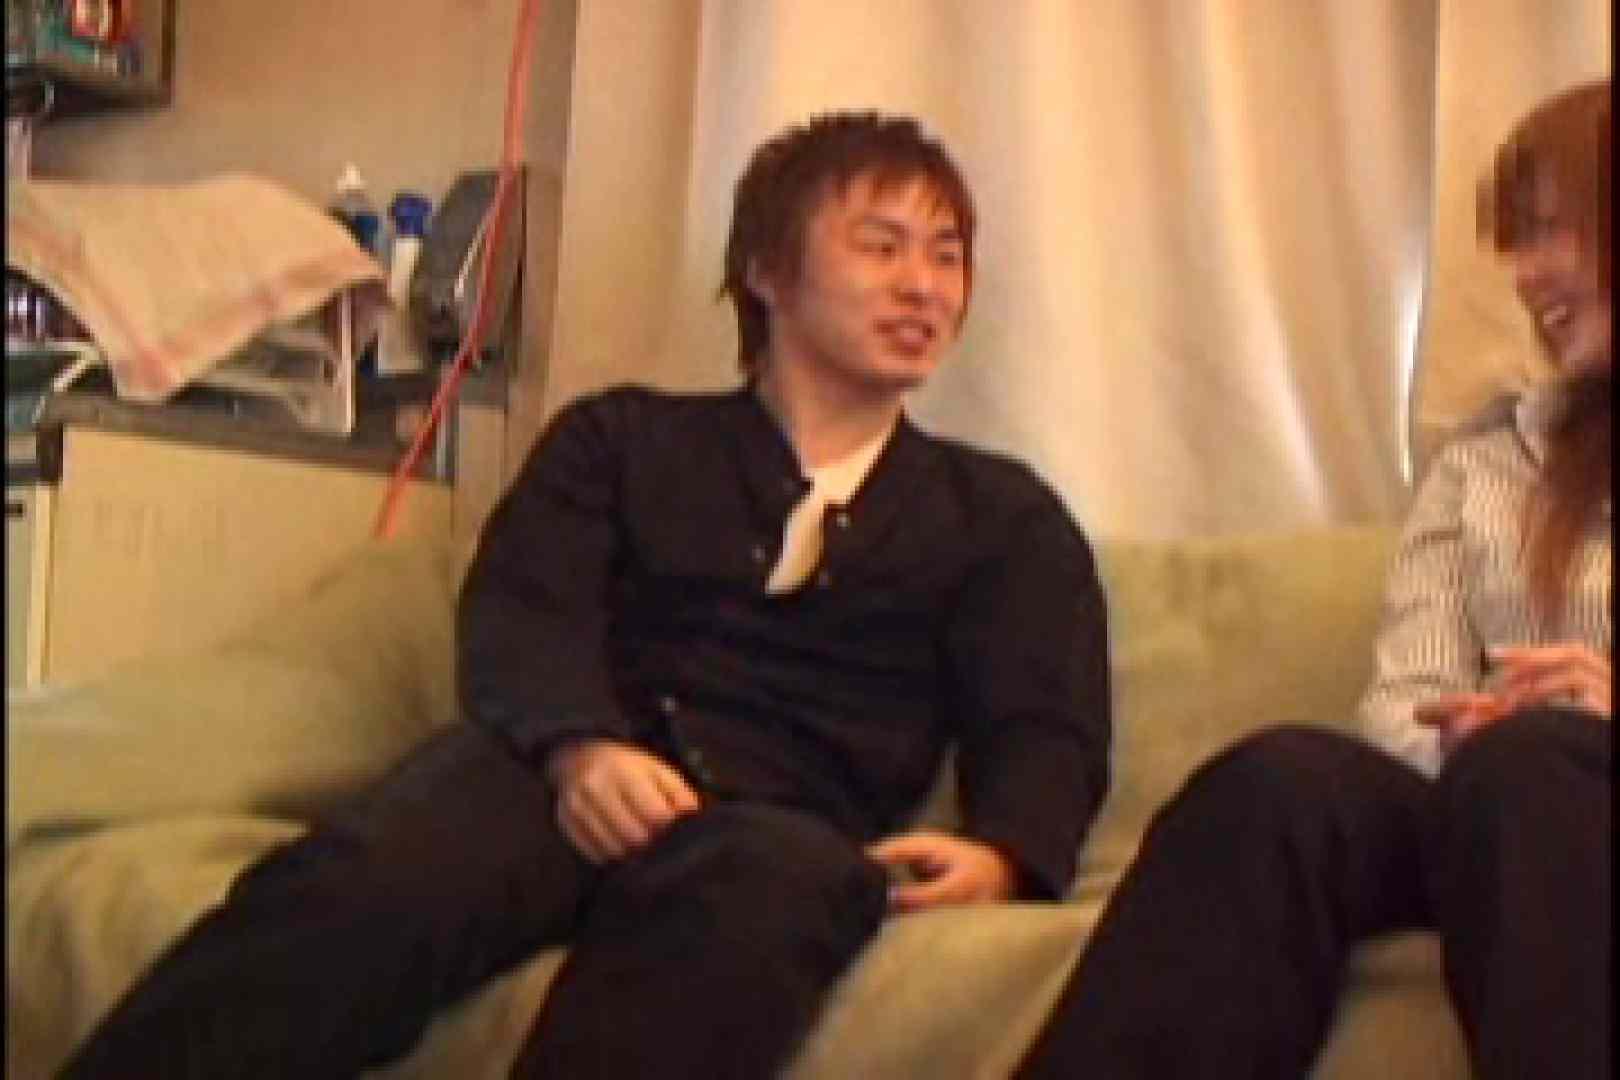 BEST OF イケメン!!男目線のガチSEX vol.03(対女性作品) ゲイのオナニー映像  56枚 7